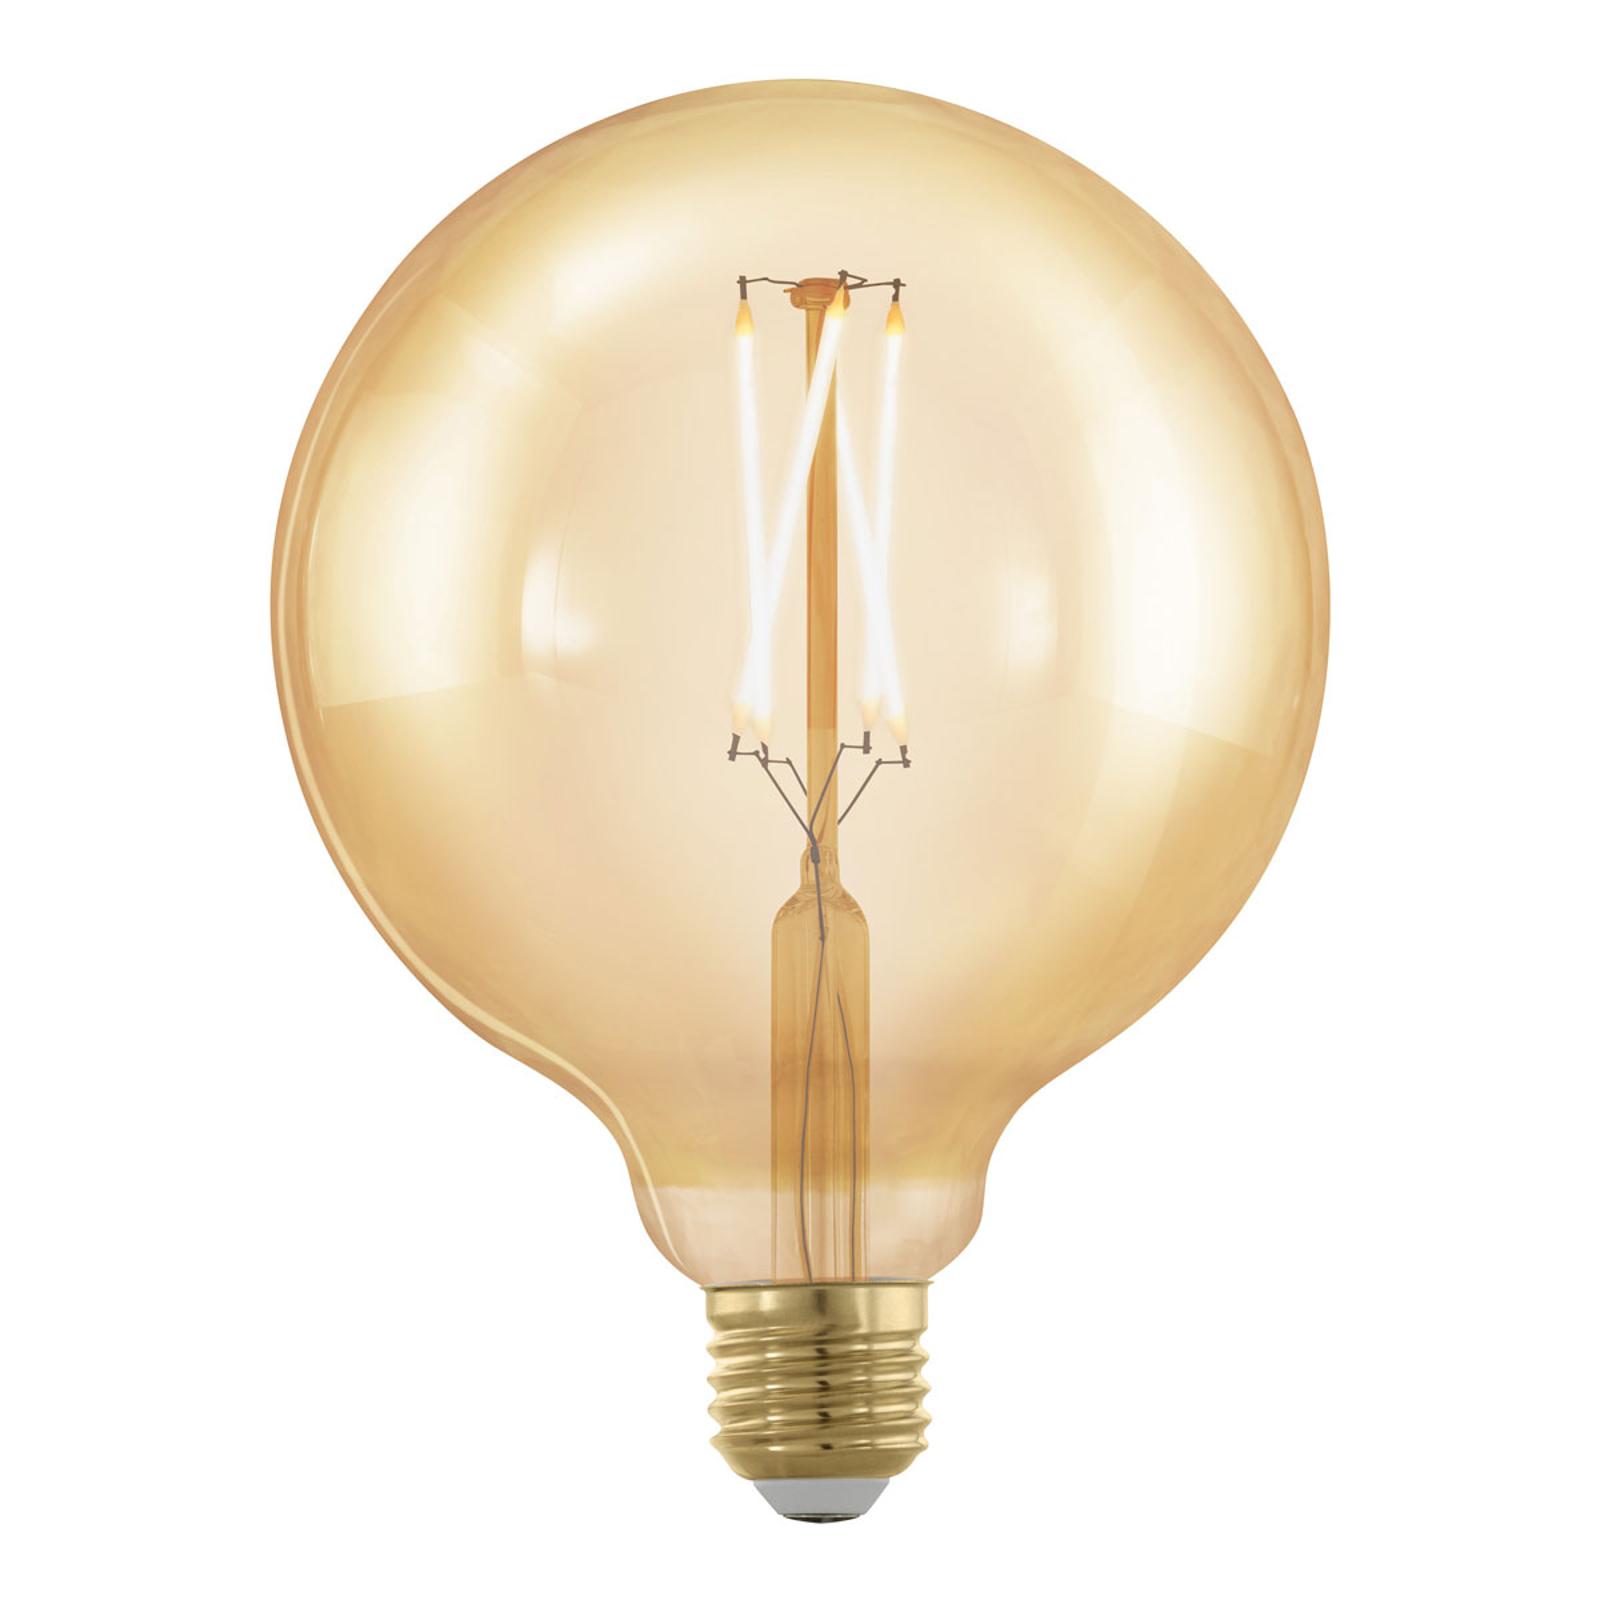 LED-globepære E27 G125 4 W 1700K gull, dimbar